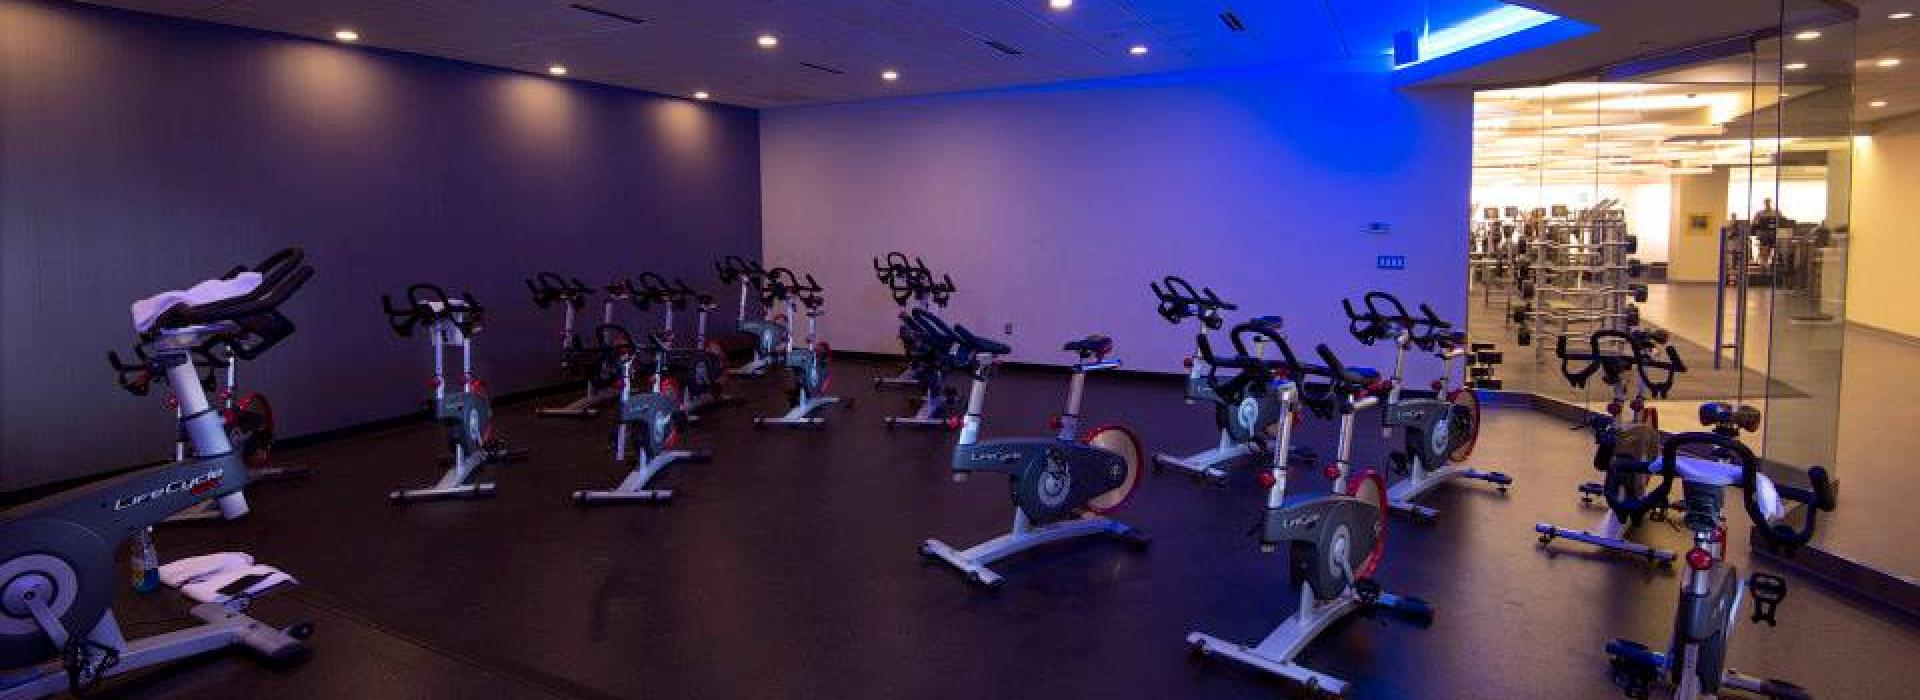 Downtown Hartford YMCA | YMCA Hartford